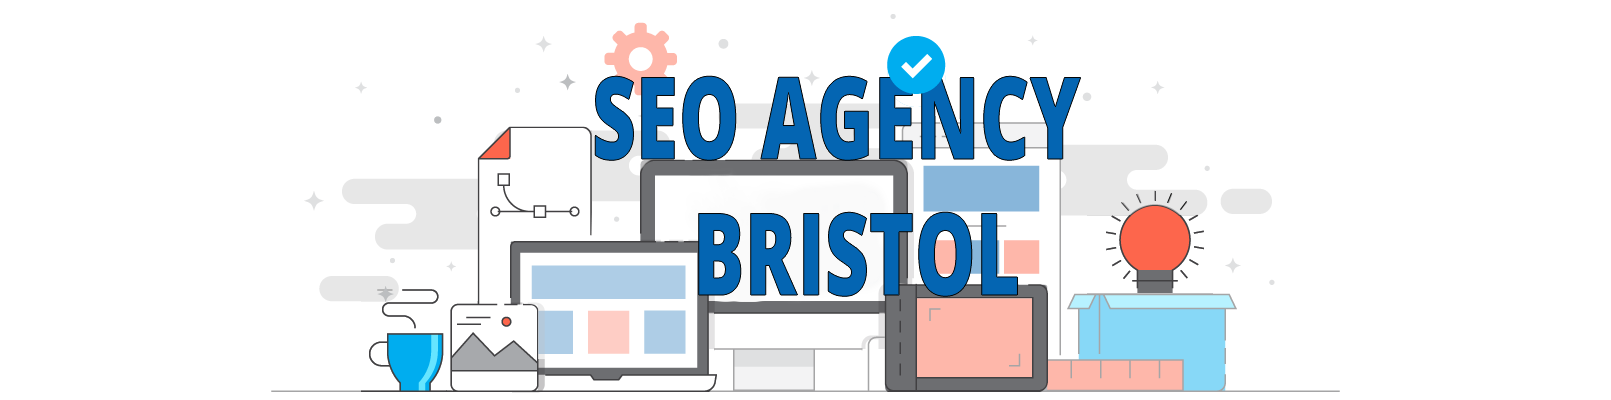 seek social seo agency bristol header with transparent background